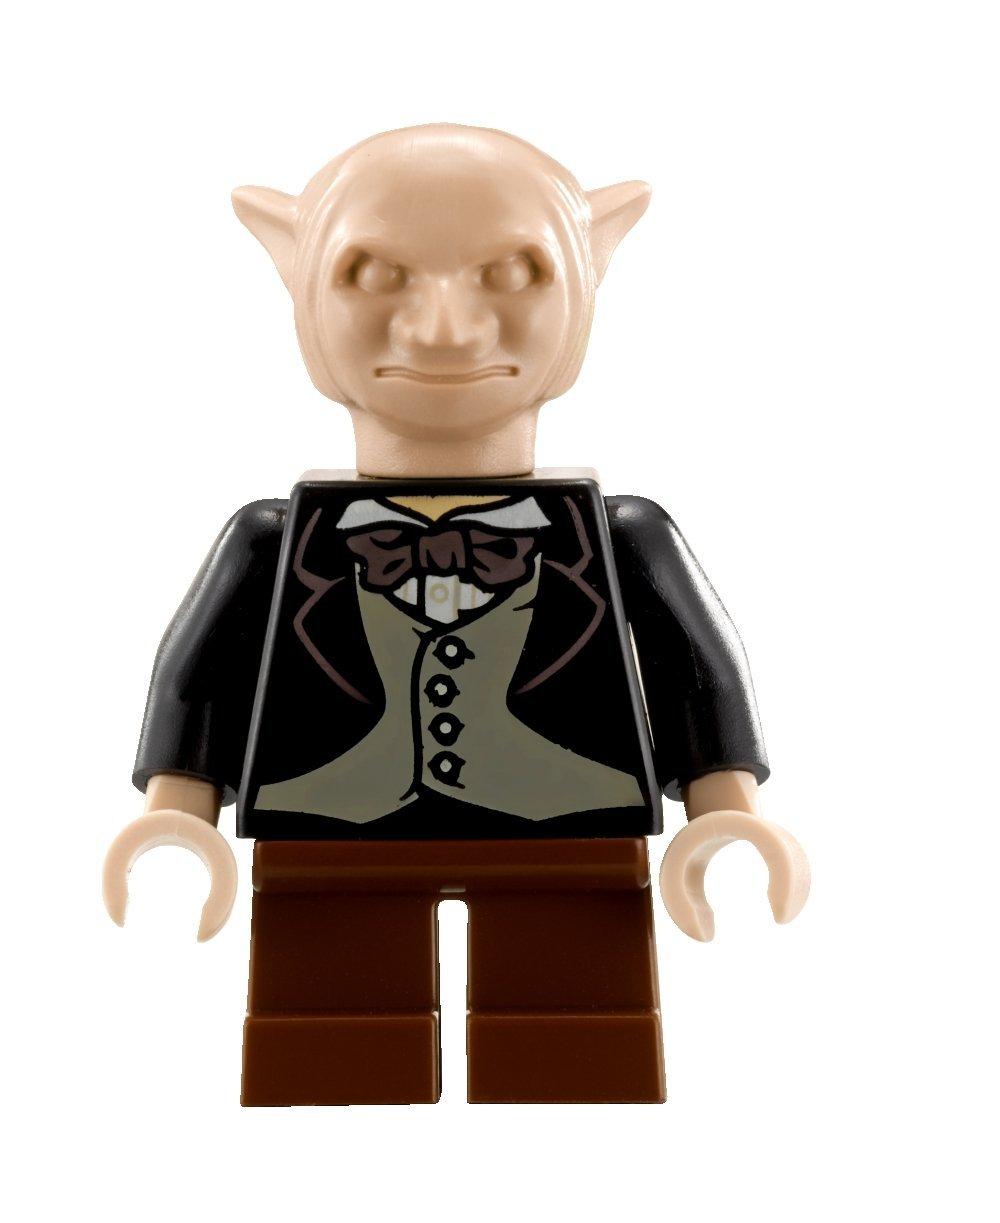 Kobold, Minifigur LEGO-Set Winkelgasse 10217 Harry Potter